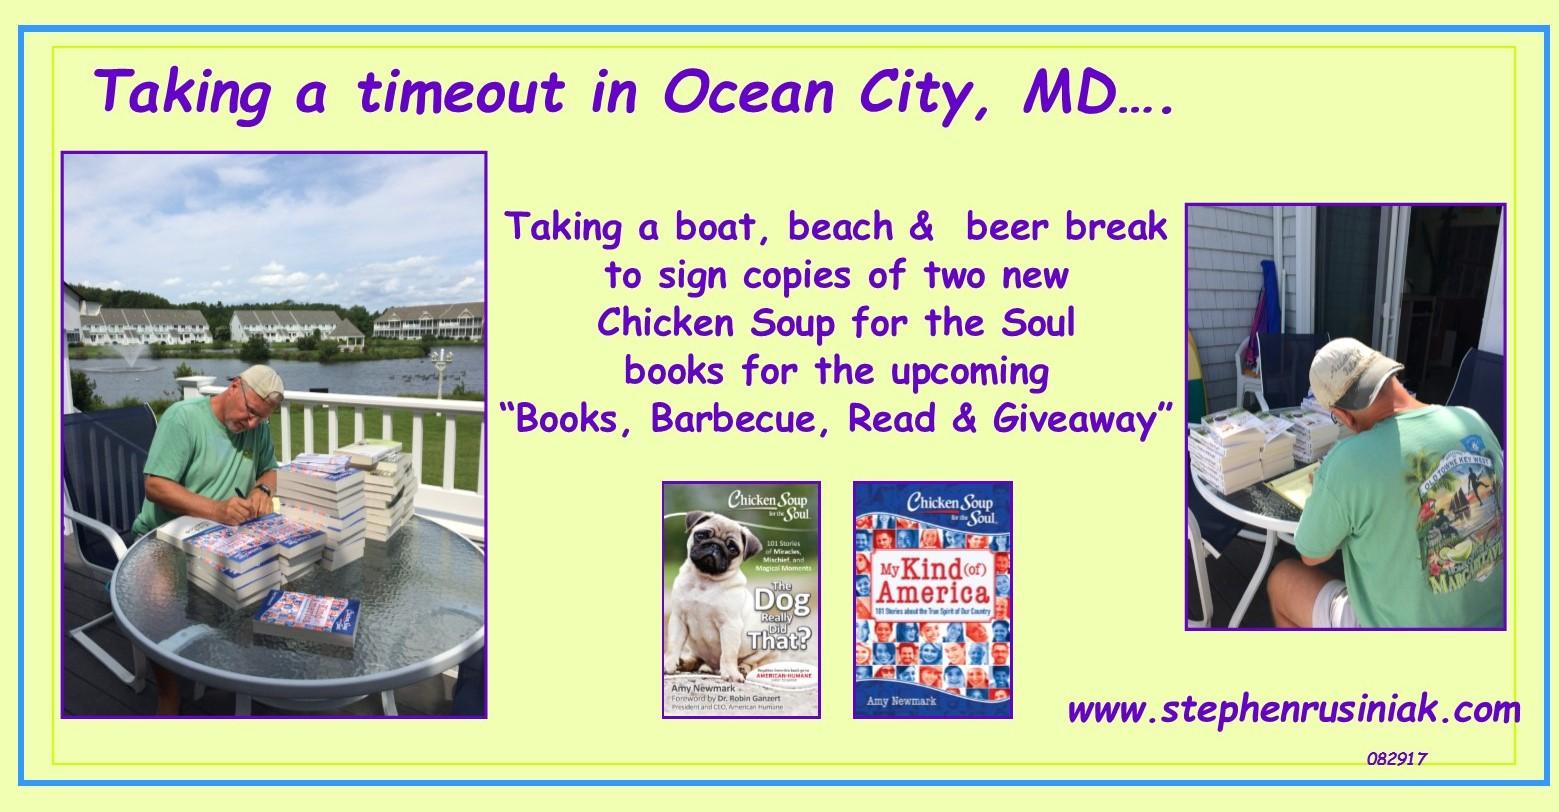 Book signing TWITTER & FB promo 082917.jpg